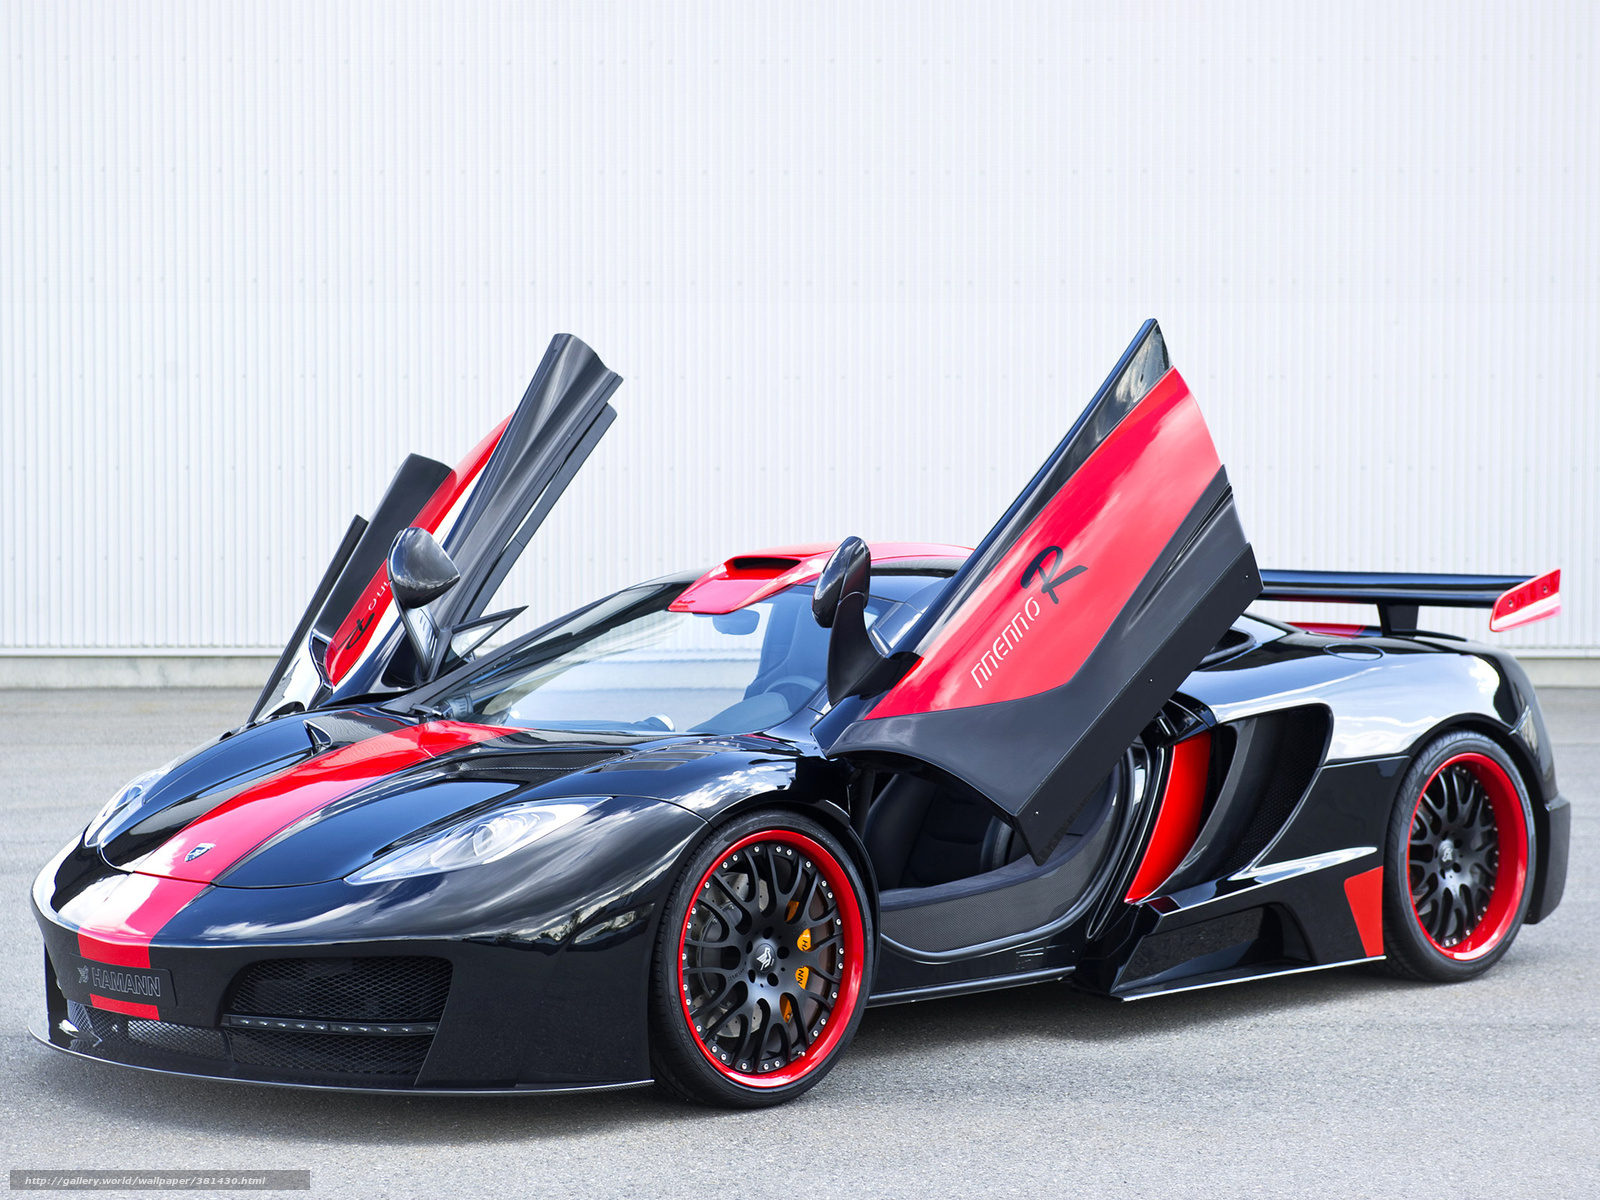 Download wallpaper hamman sports car black red free desktop wallpaper in the resolution 2048x1536 picture 381430